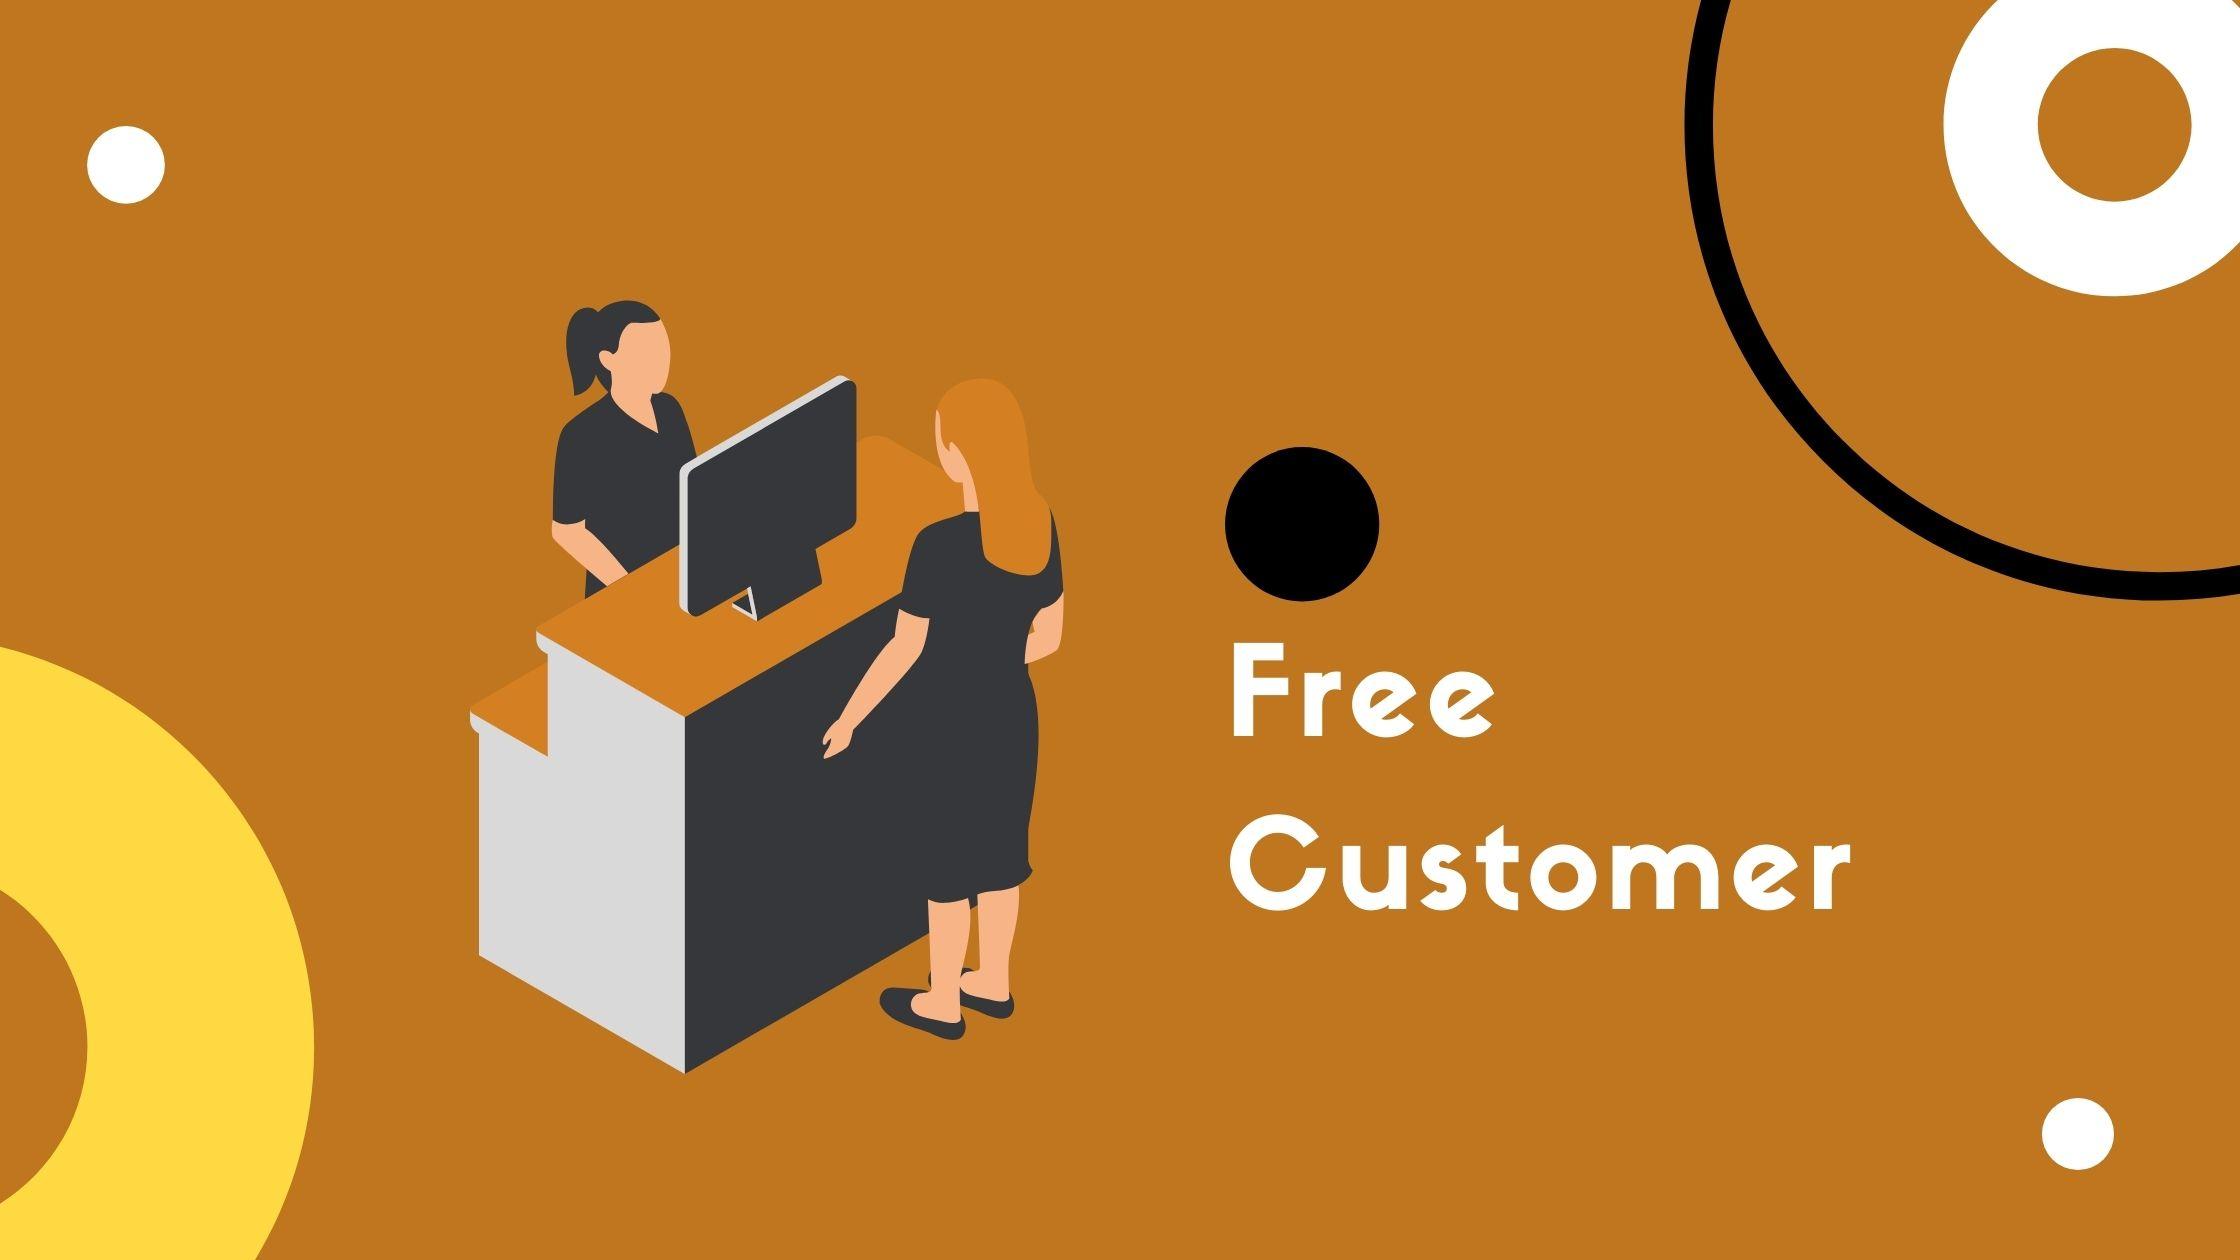 Free Customer - Health Portal US